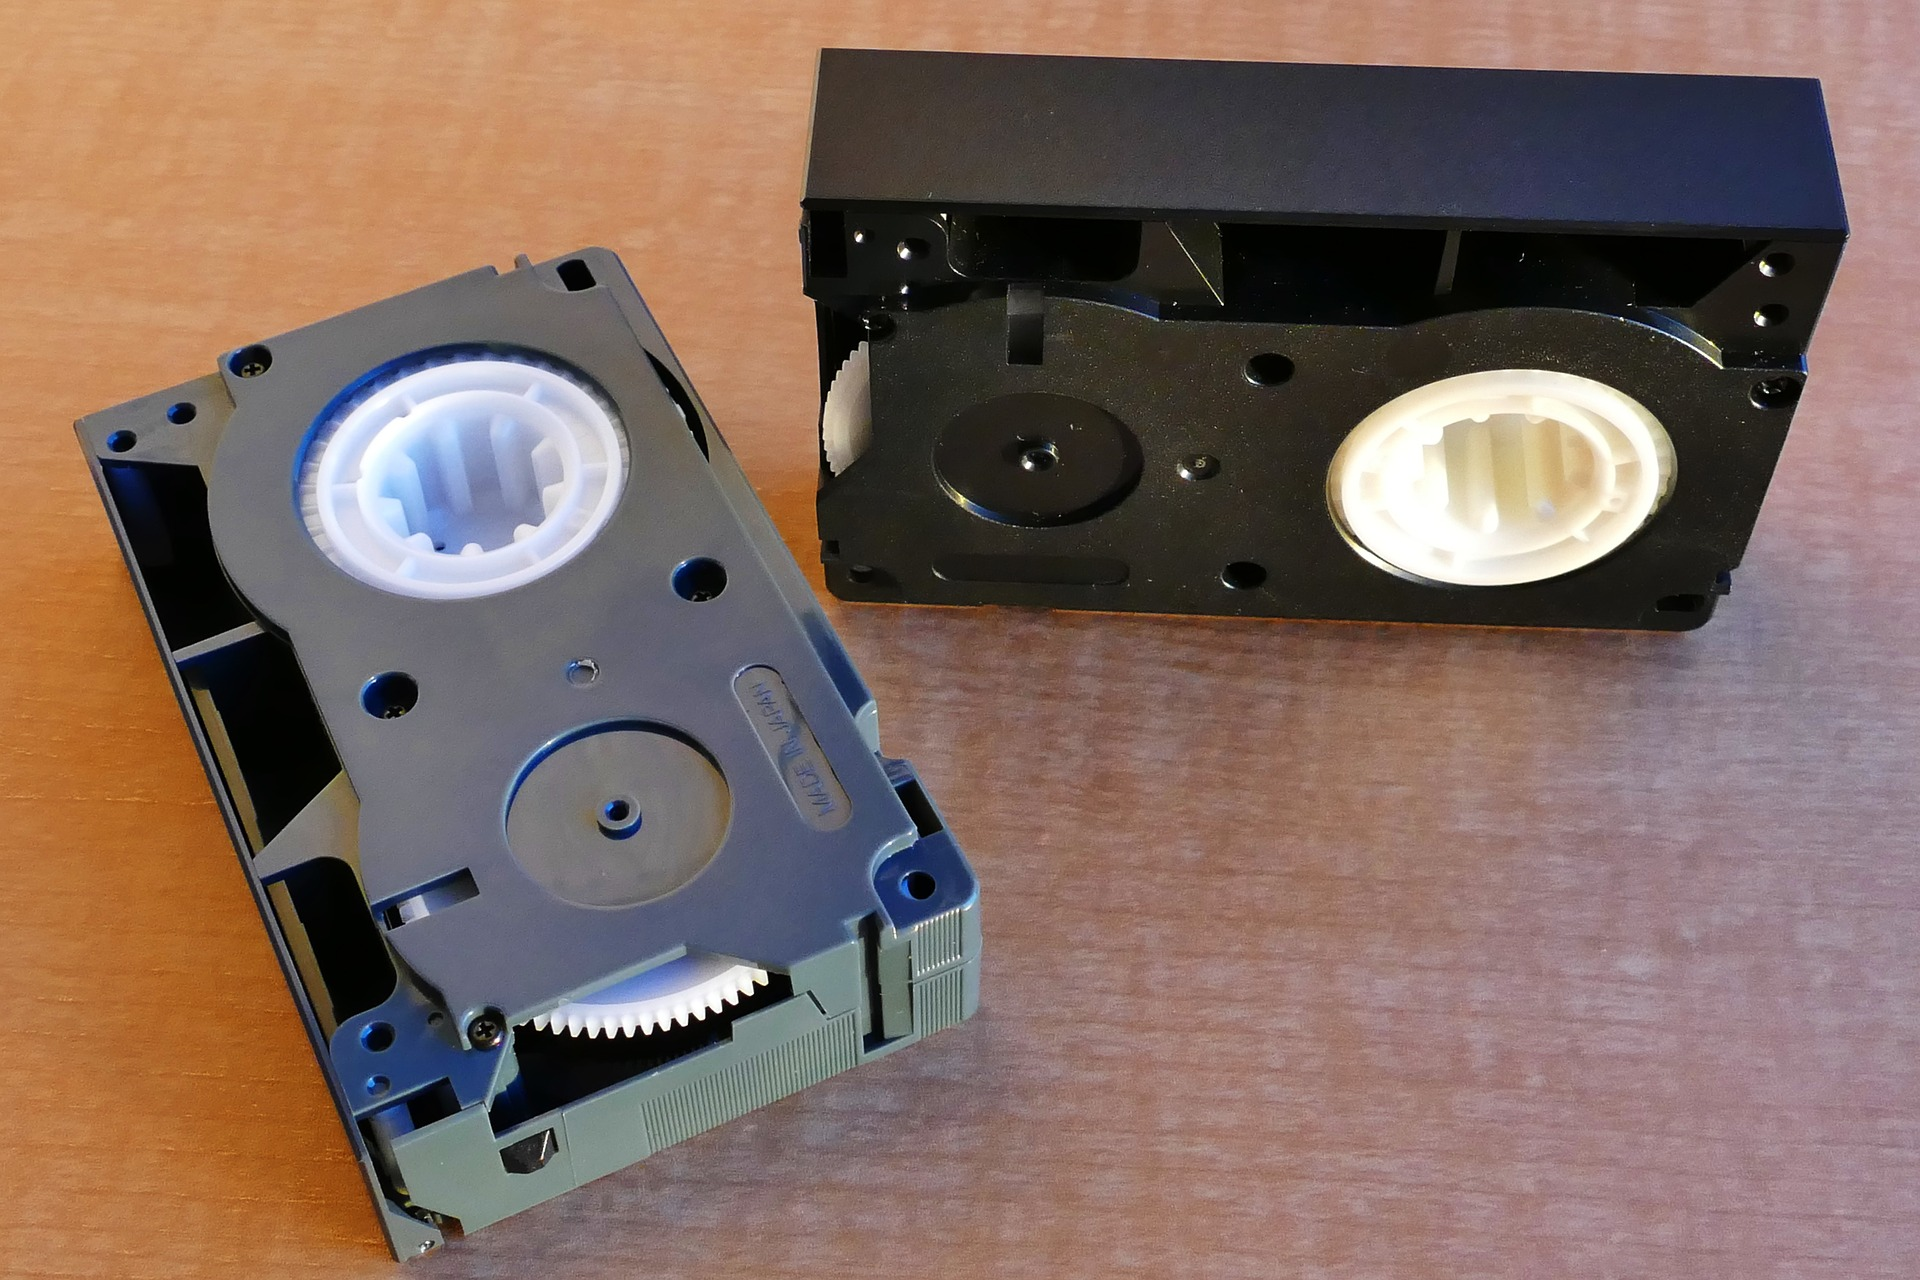 vhs tapes-1140478_1920.jpg